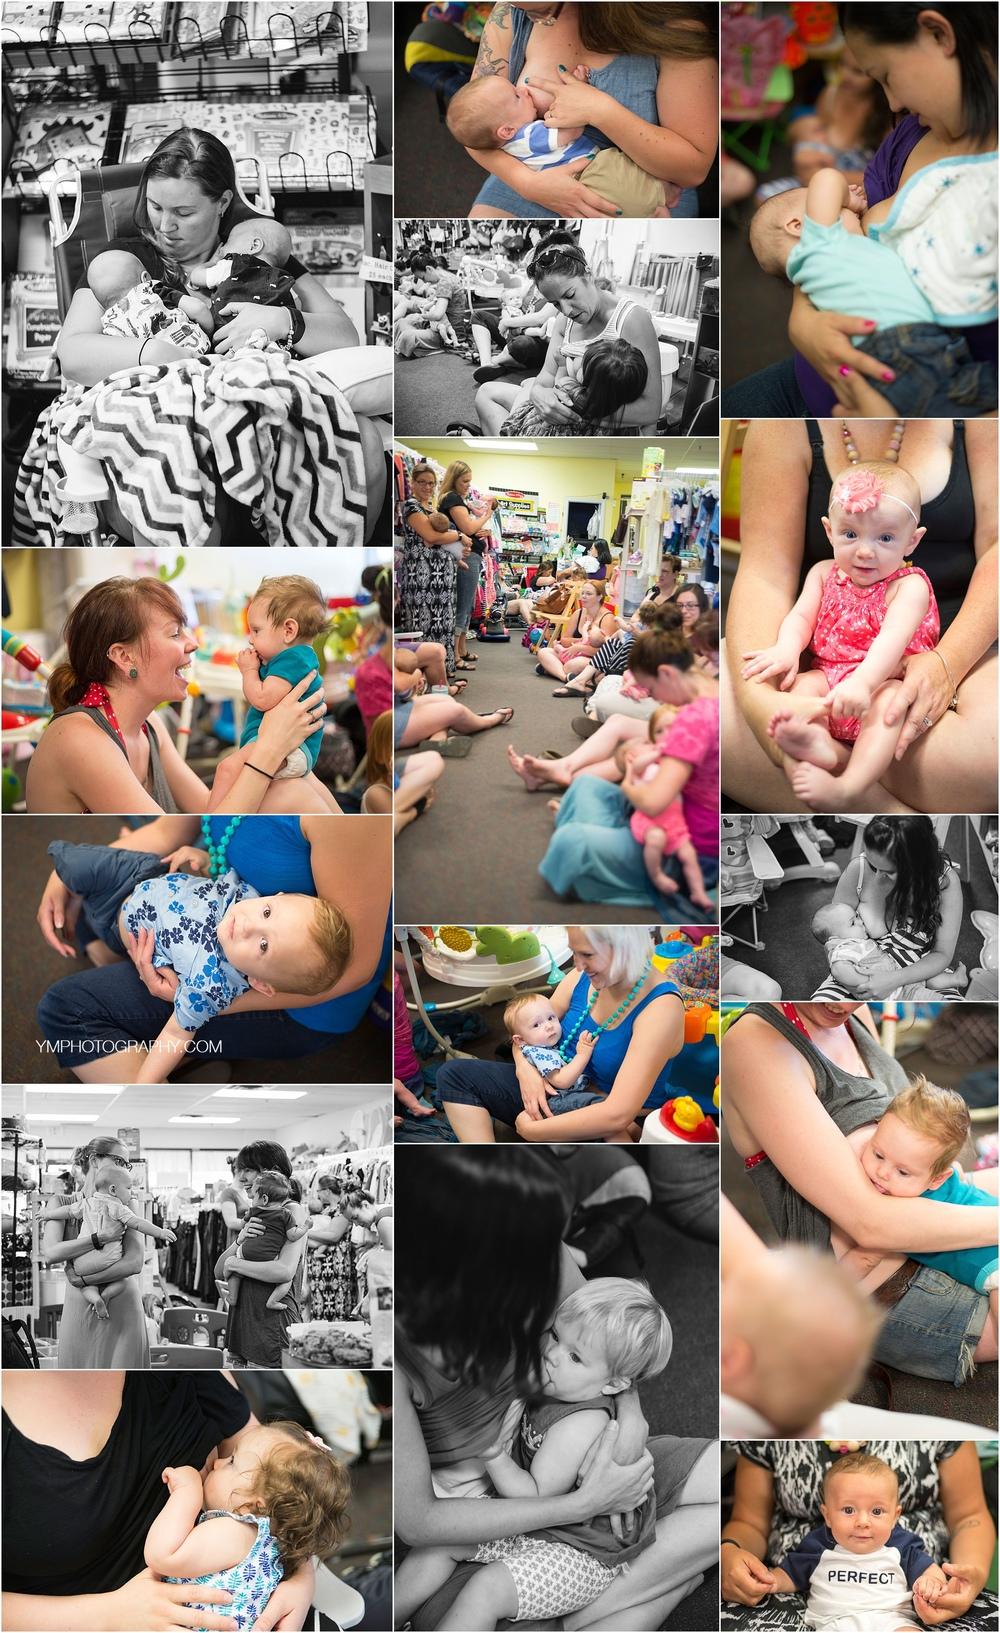 ym-photography-glens-falls-ny-newborn-photographer